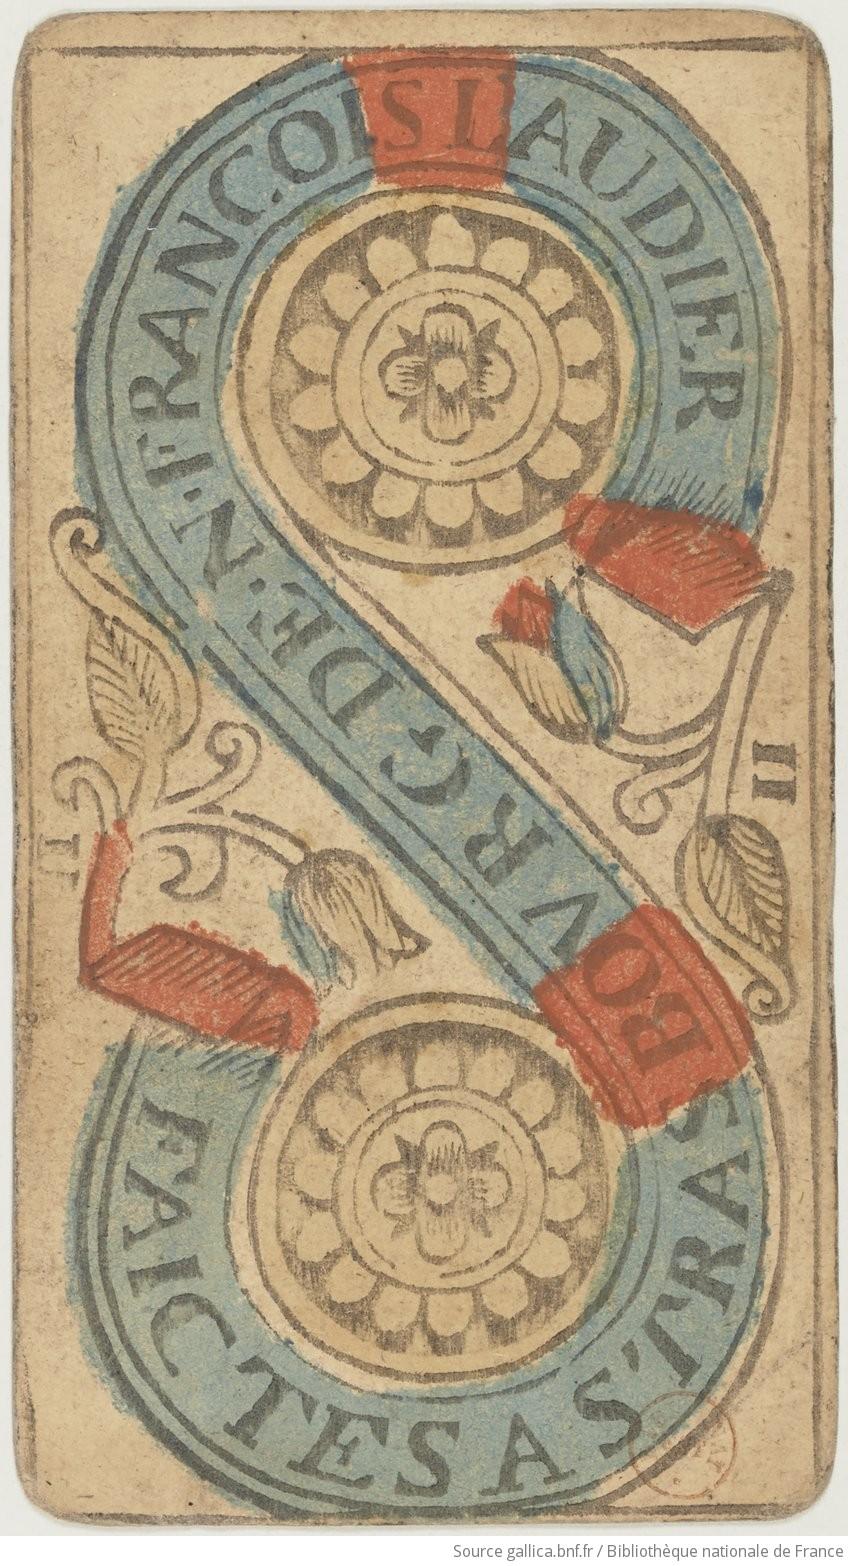 http://gallica.bnf.fr/ark:/12148/btv1b10513882m/f39.highres